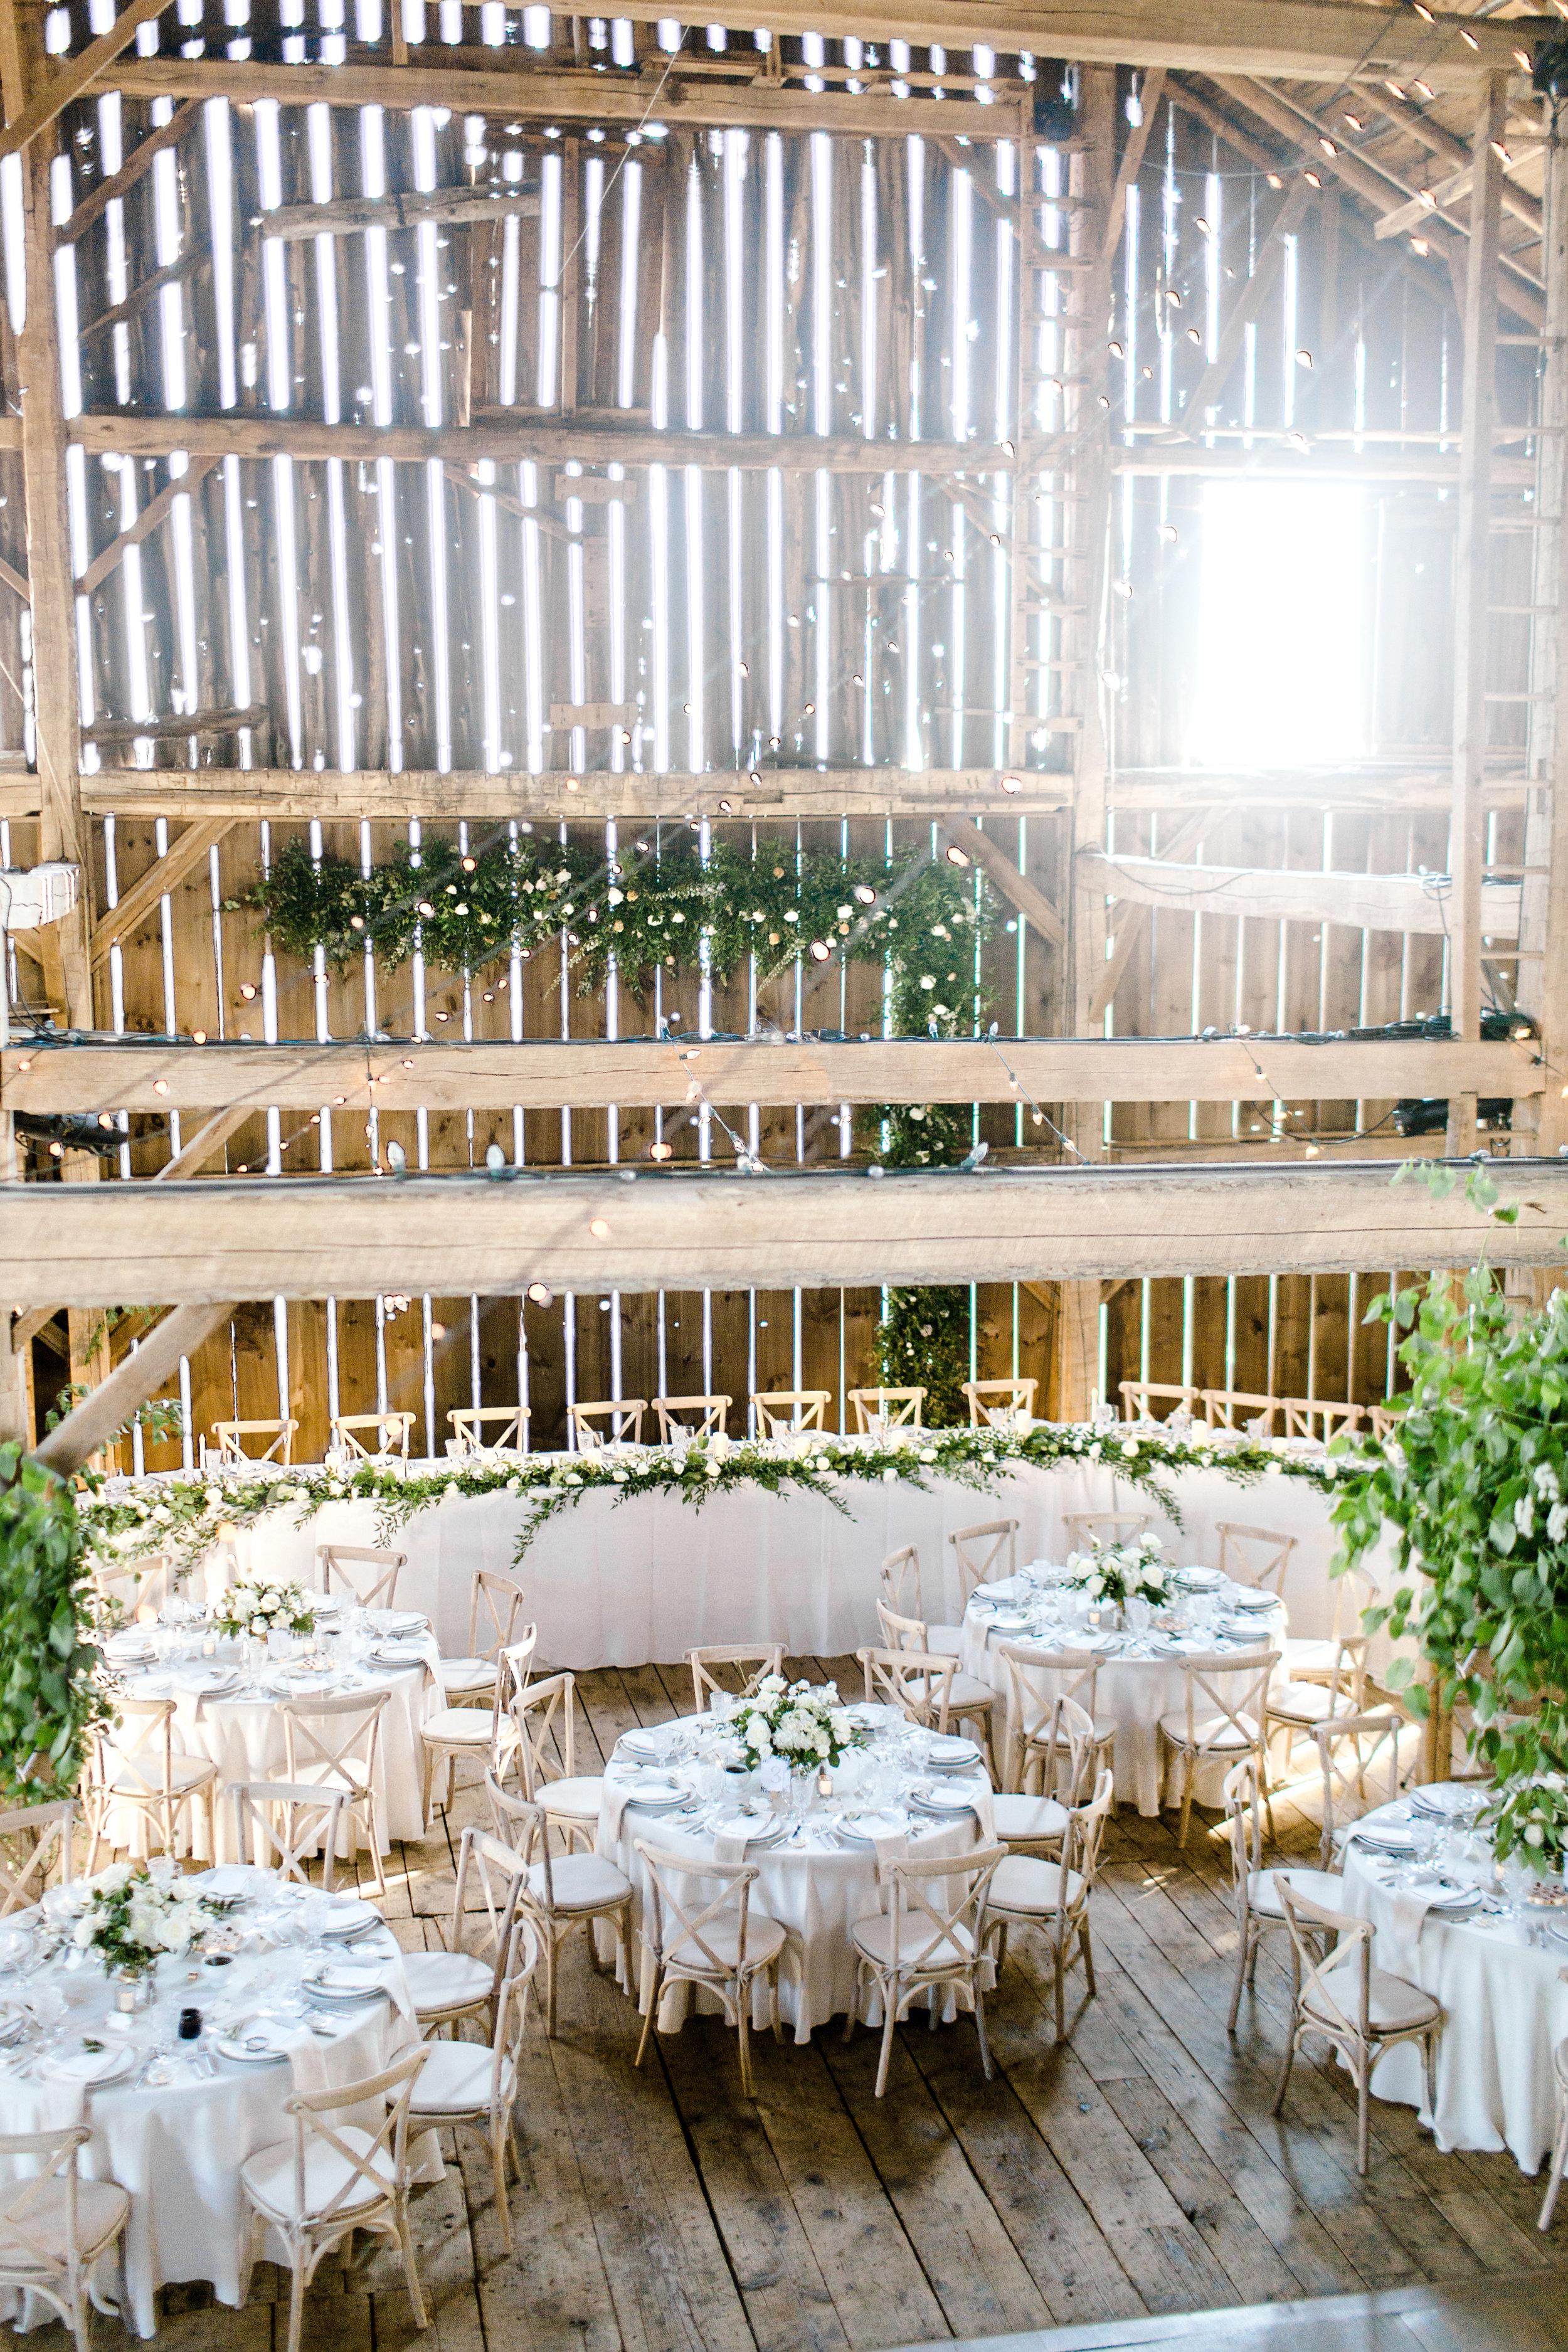 cambium-farms-kurtz-wedding-toronto-photographer-langdon-film-richelle-hunter-cori-joey-previews-6.jpg